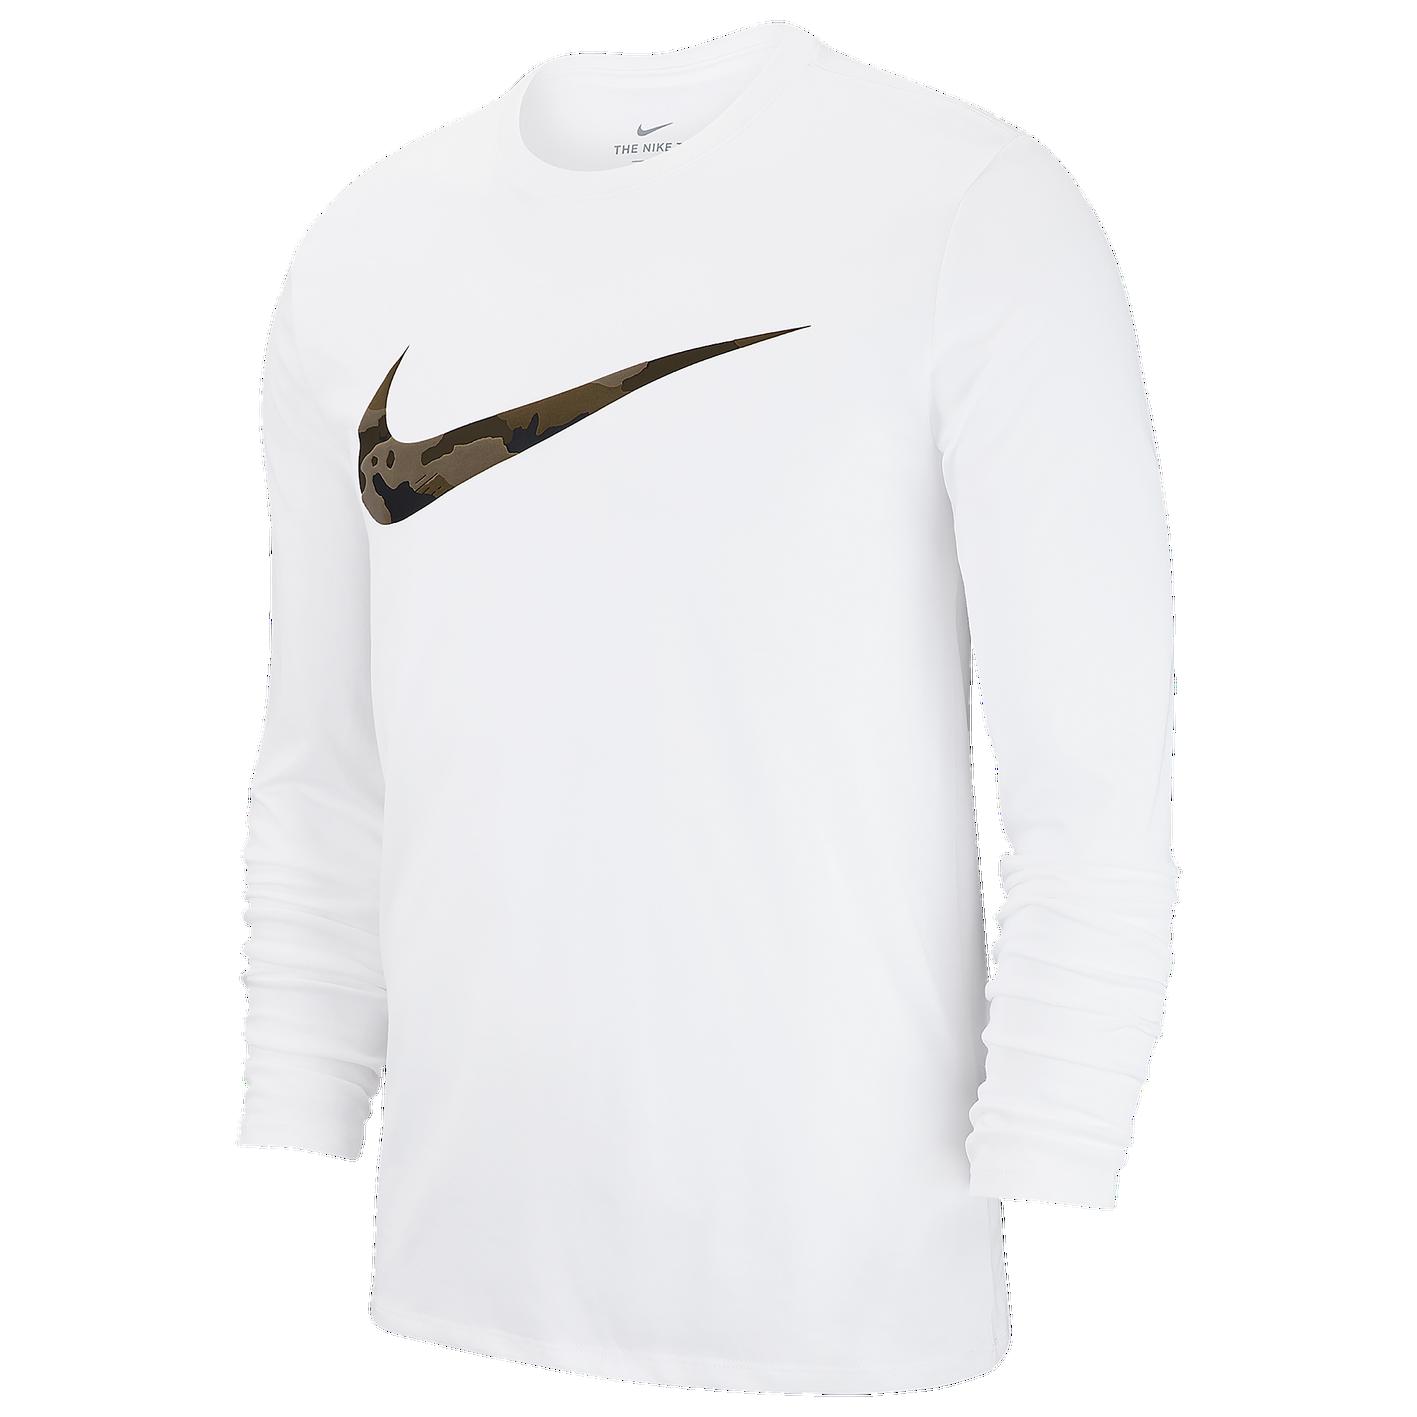 46261d032063 Nike Dri-FIT Cotton L S Swoosh Camo T-Shirt - Men s - Training ...